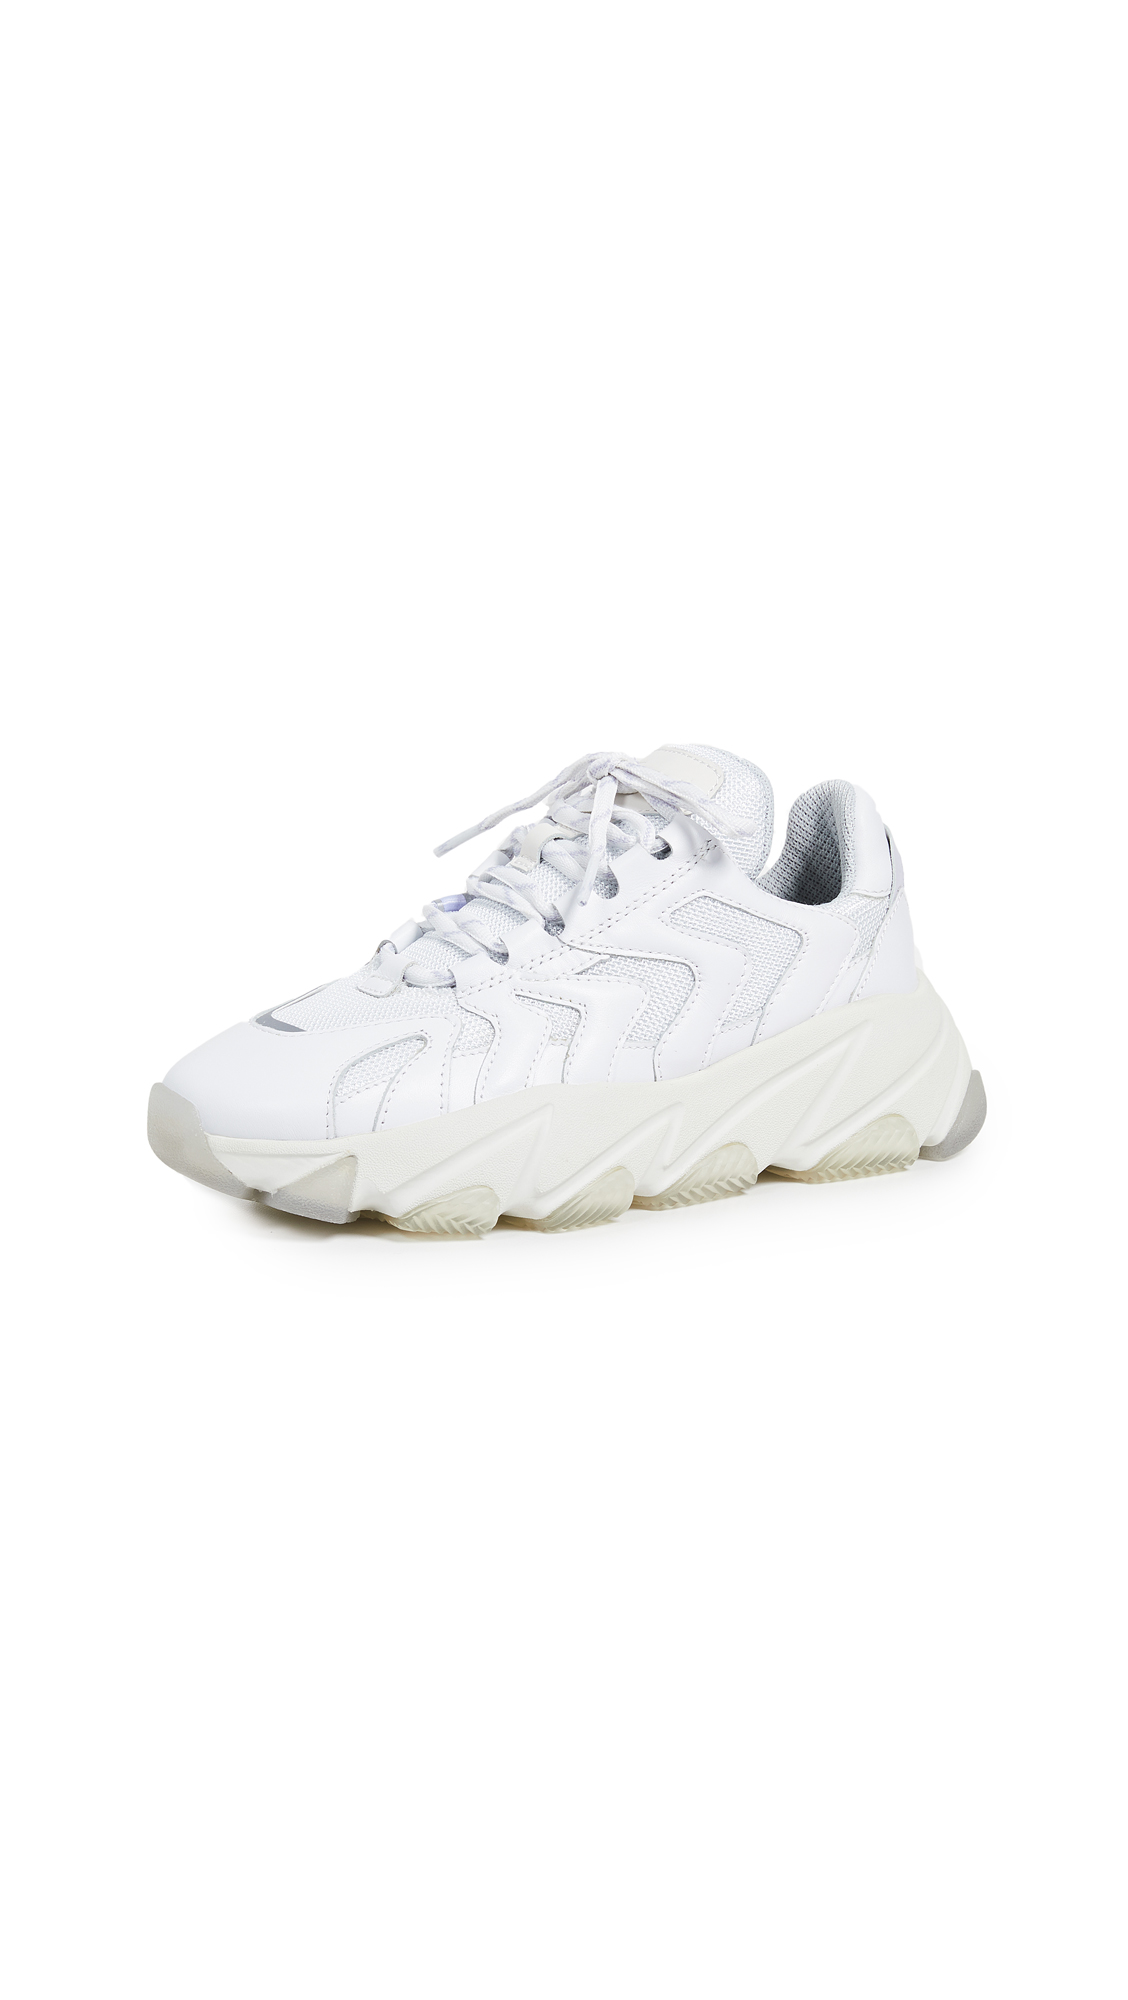 Ash Extreme Sneakers - White/Lavender/Reflex Silver